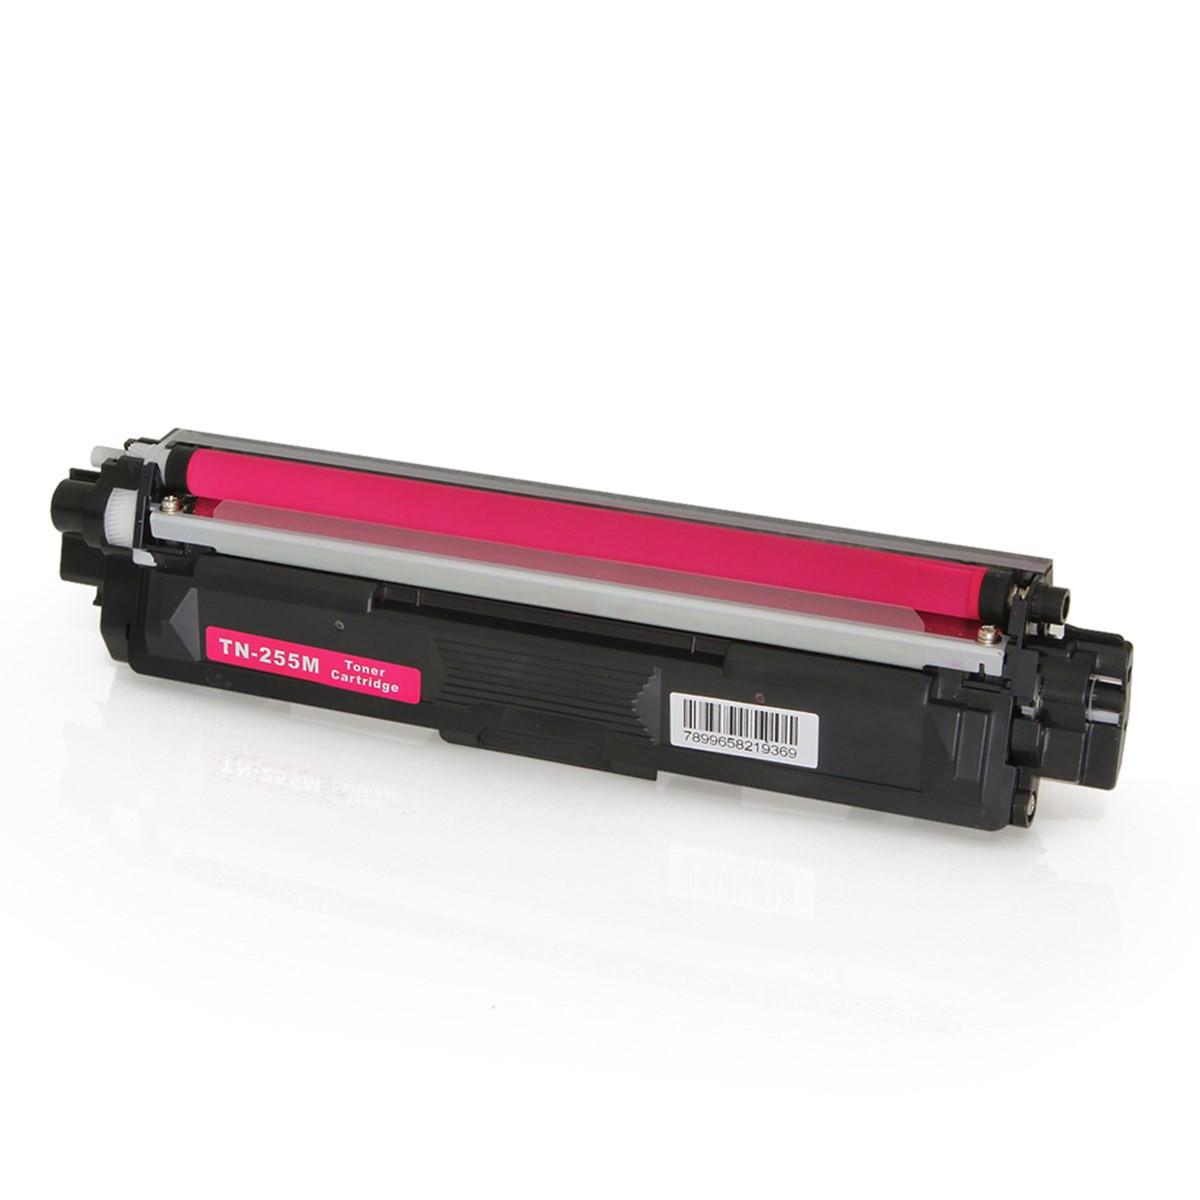 Toner Compatível com Brother TN221 TN225 Magenta | HL3170 MFC9130 HL3140 MFC9020 | Importado 2.2k